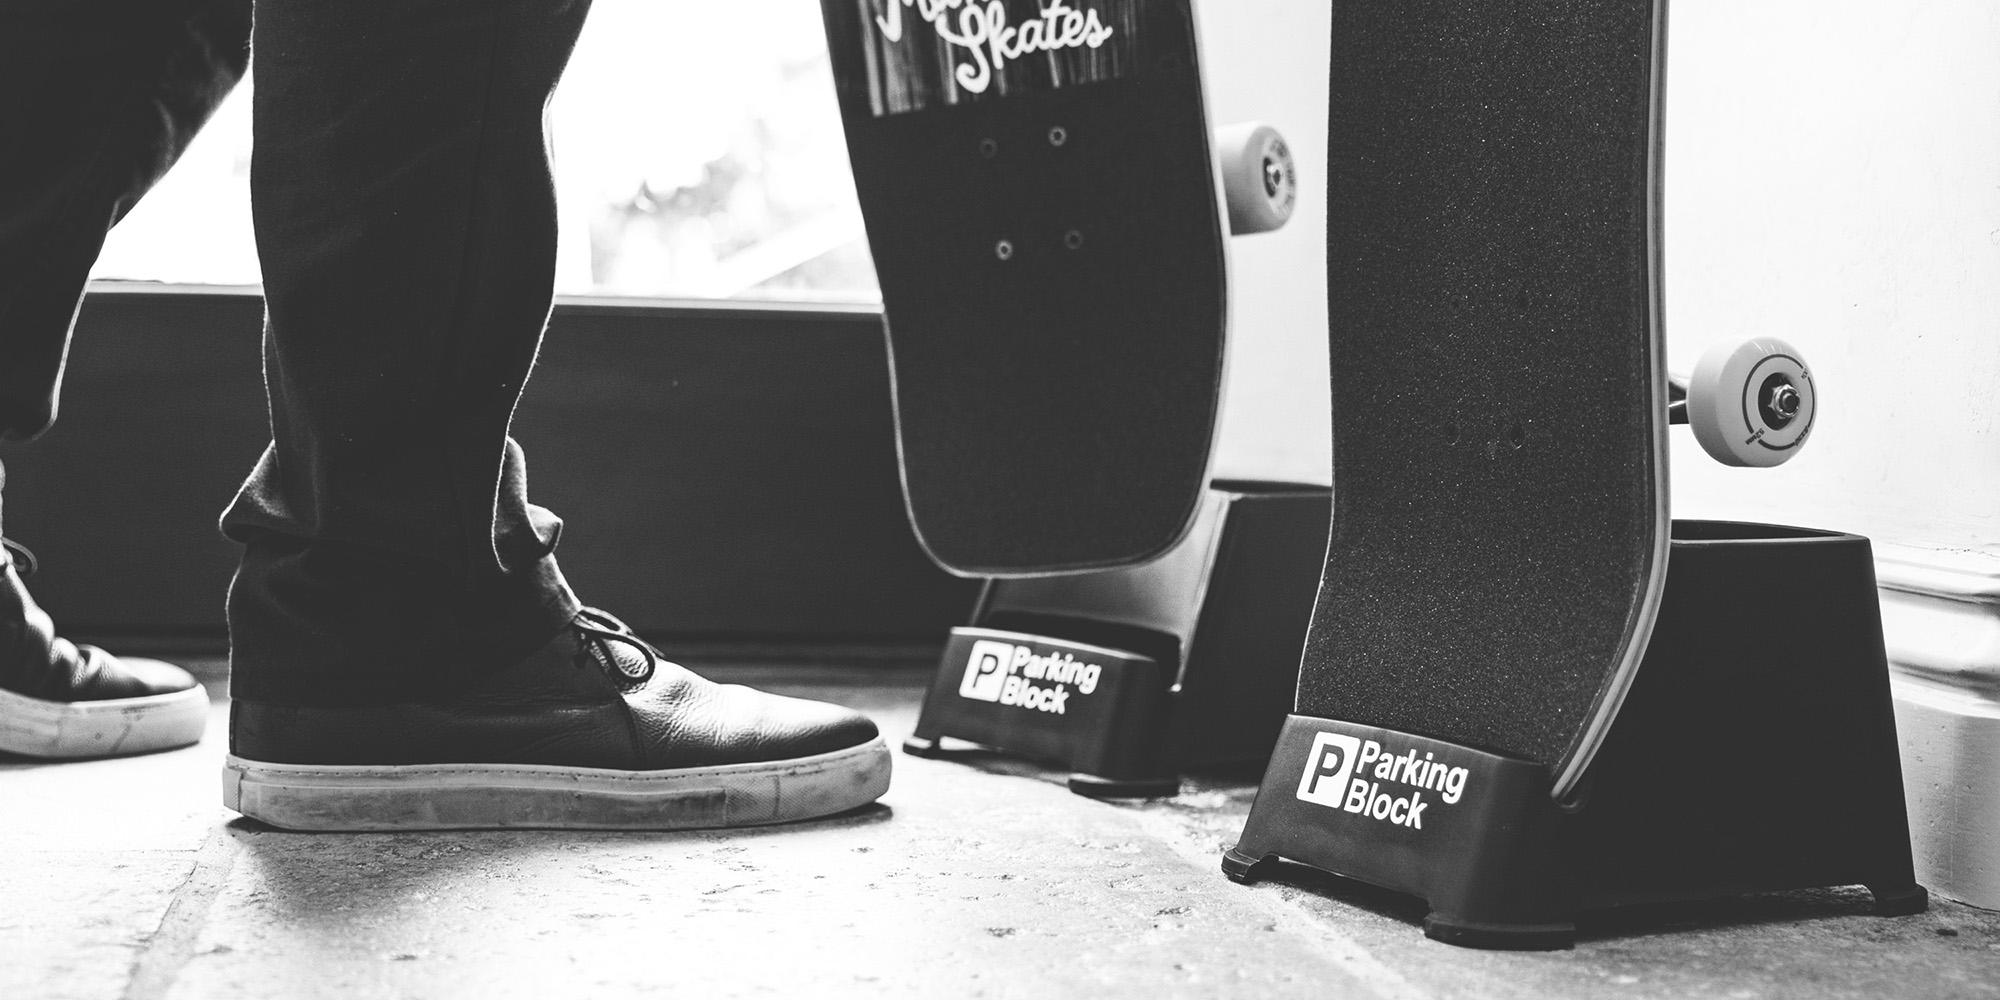 Parking Block – Skateboard Stands